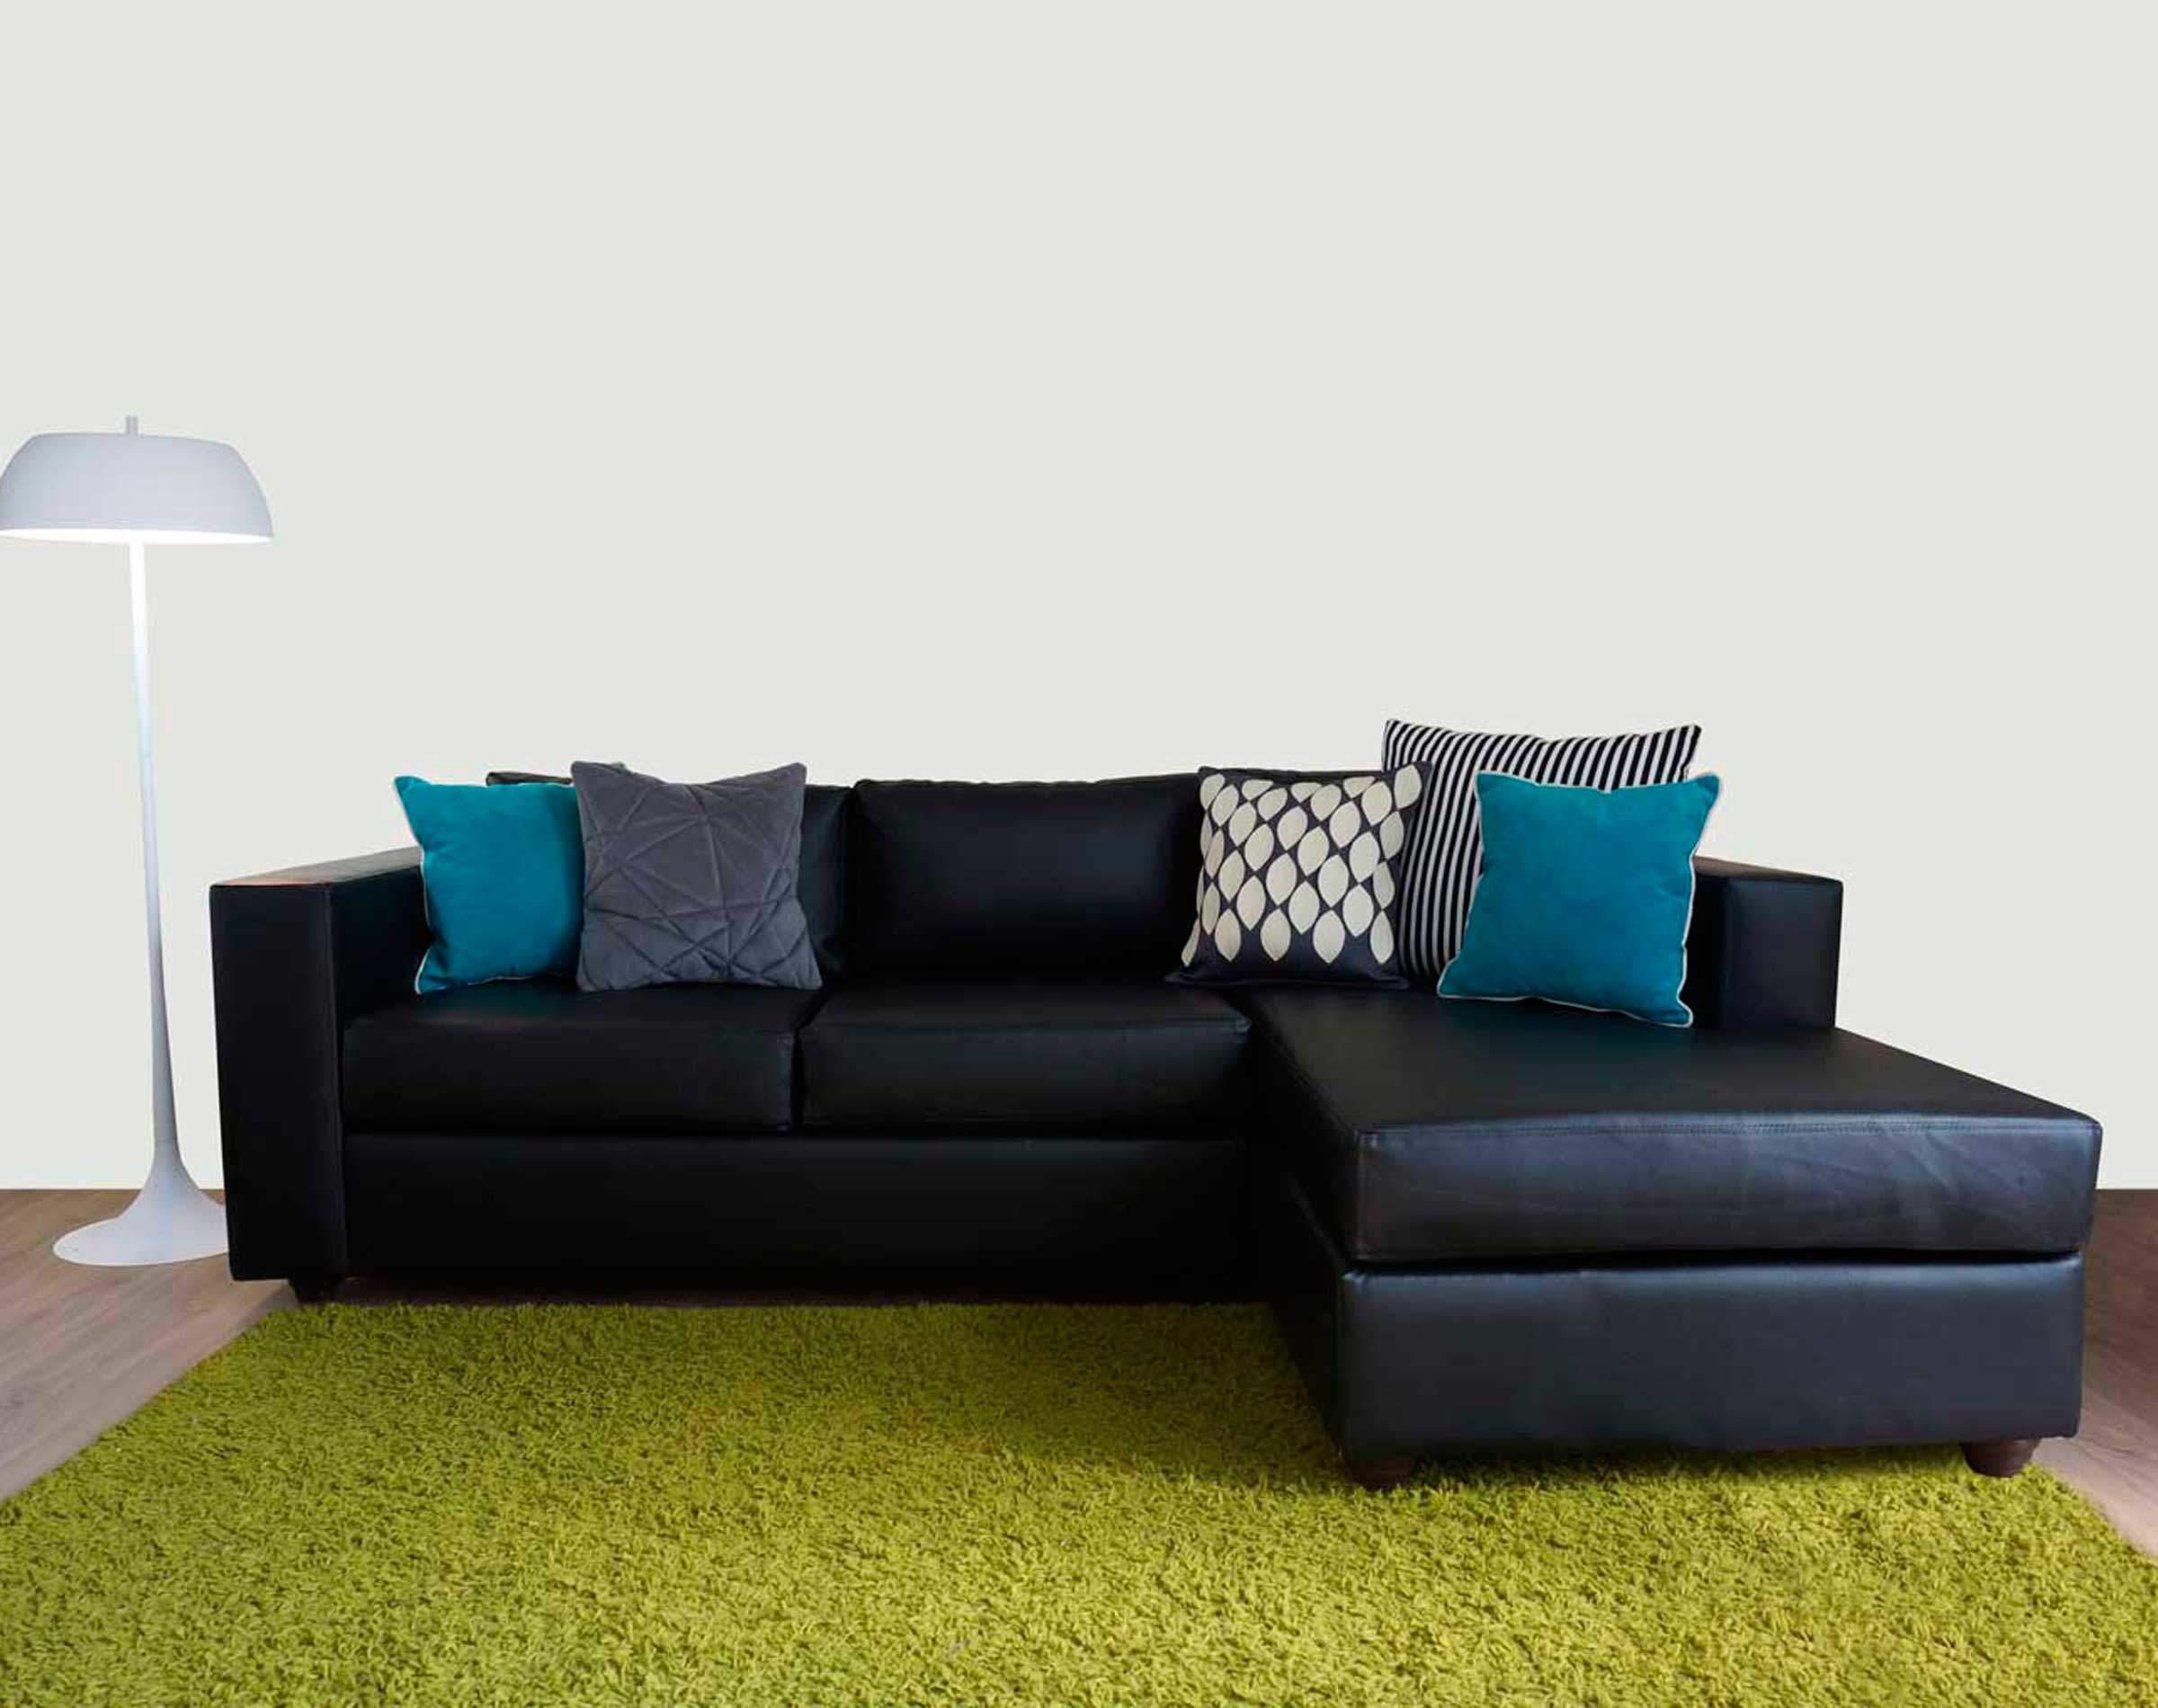 Sof seccional m naco chaise longue izquierdo pu living store for Sofa seccional zibel toronto